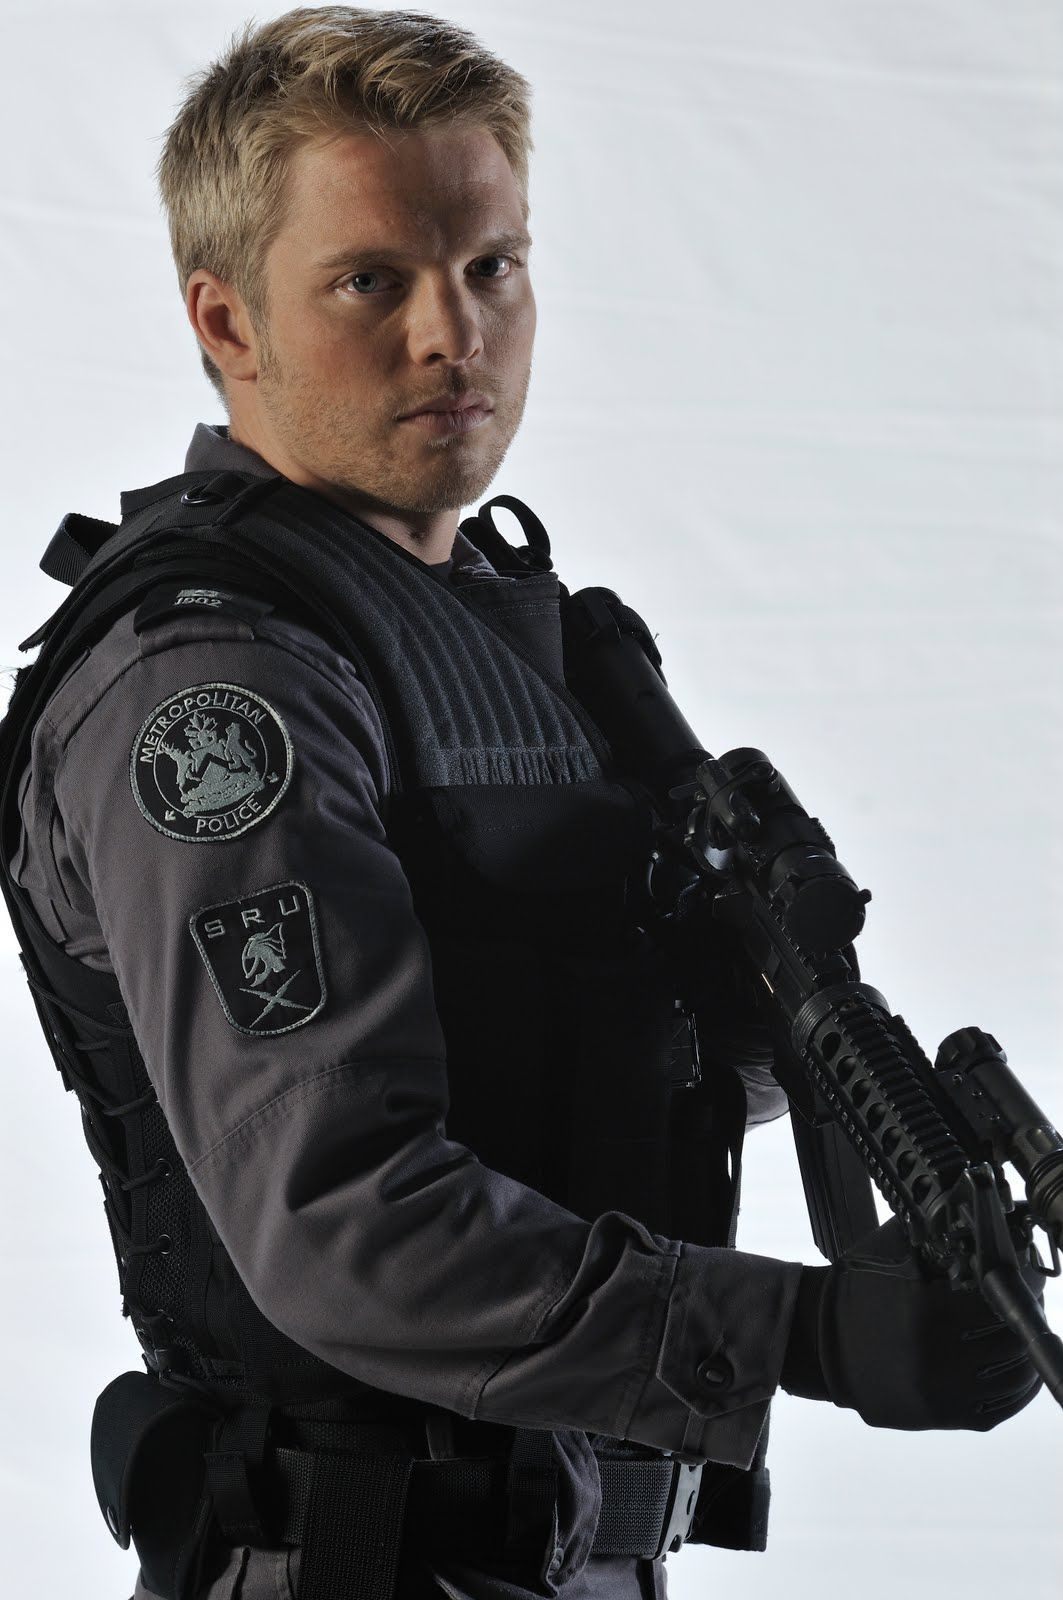 David Paetka... Played Sam Braddock